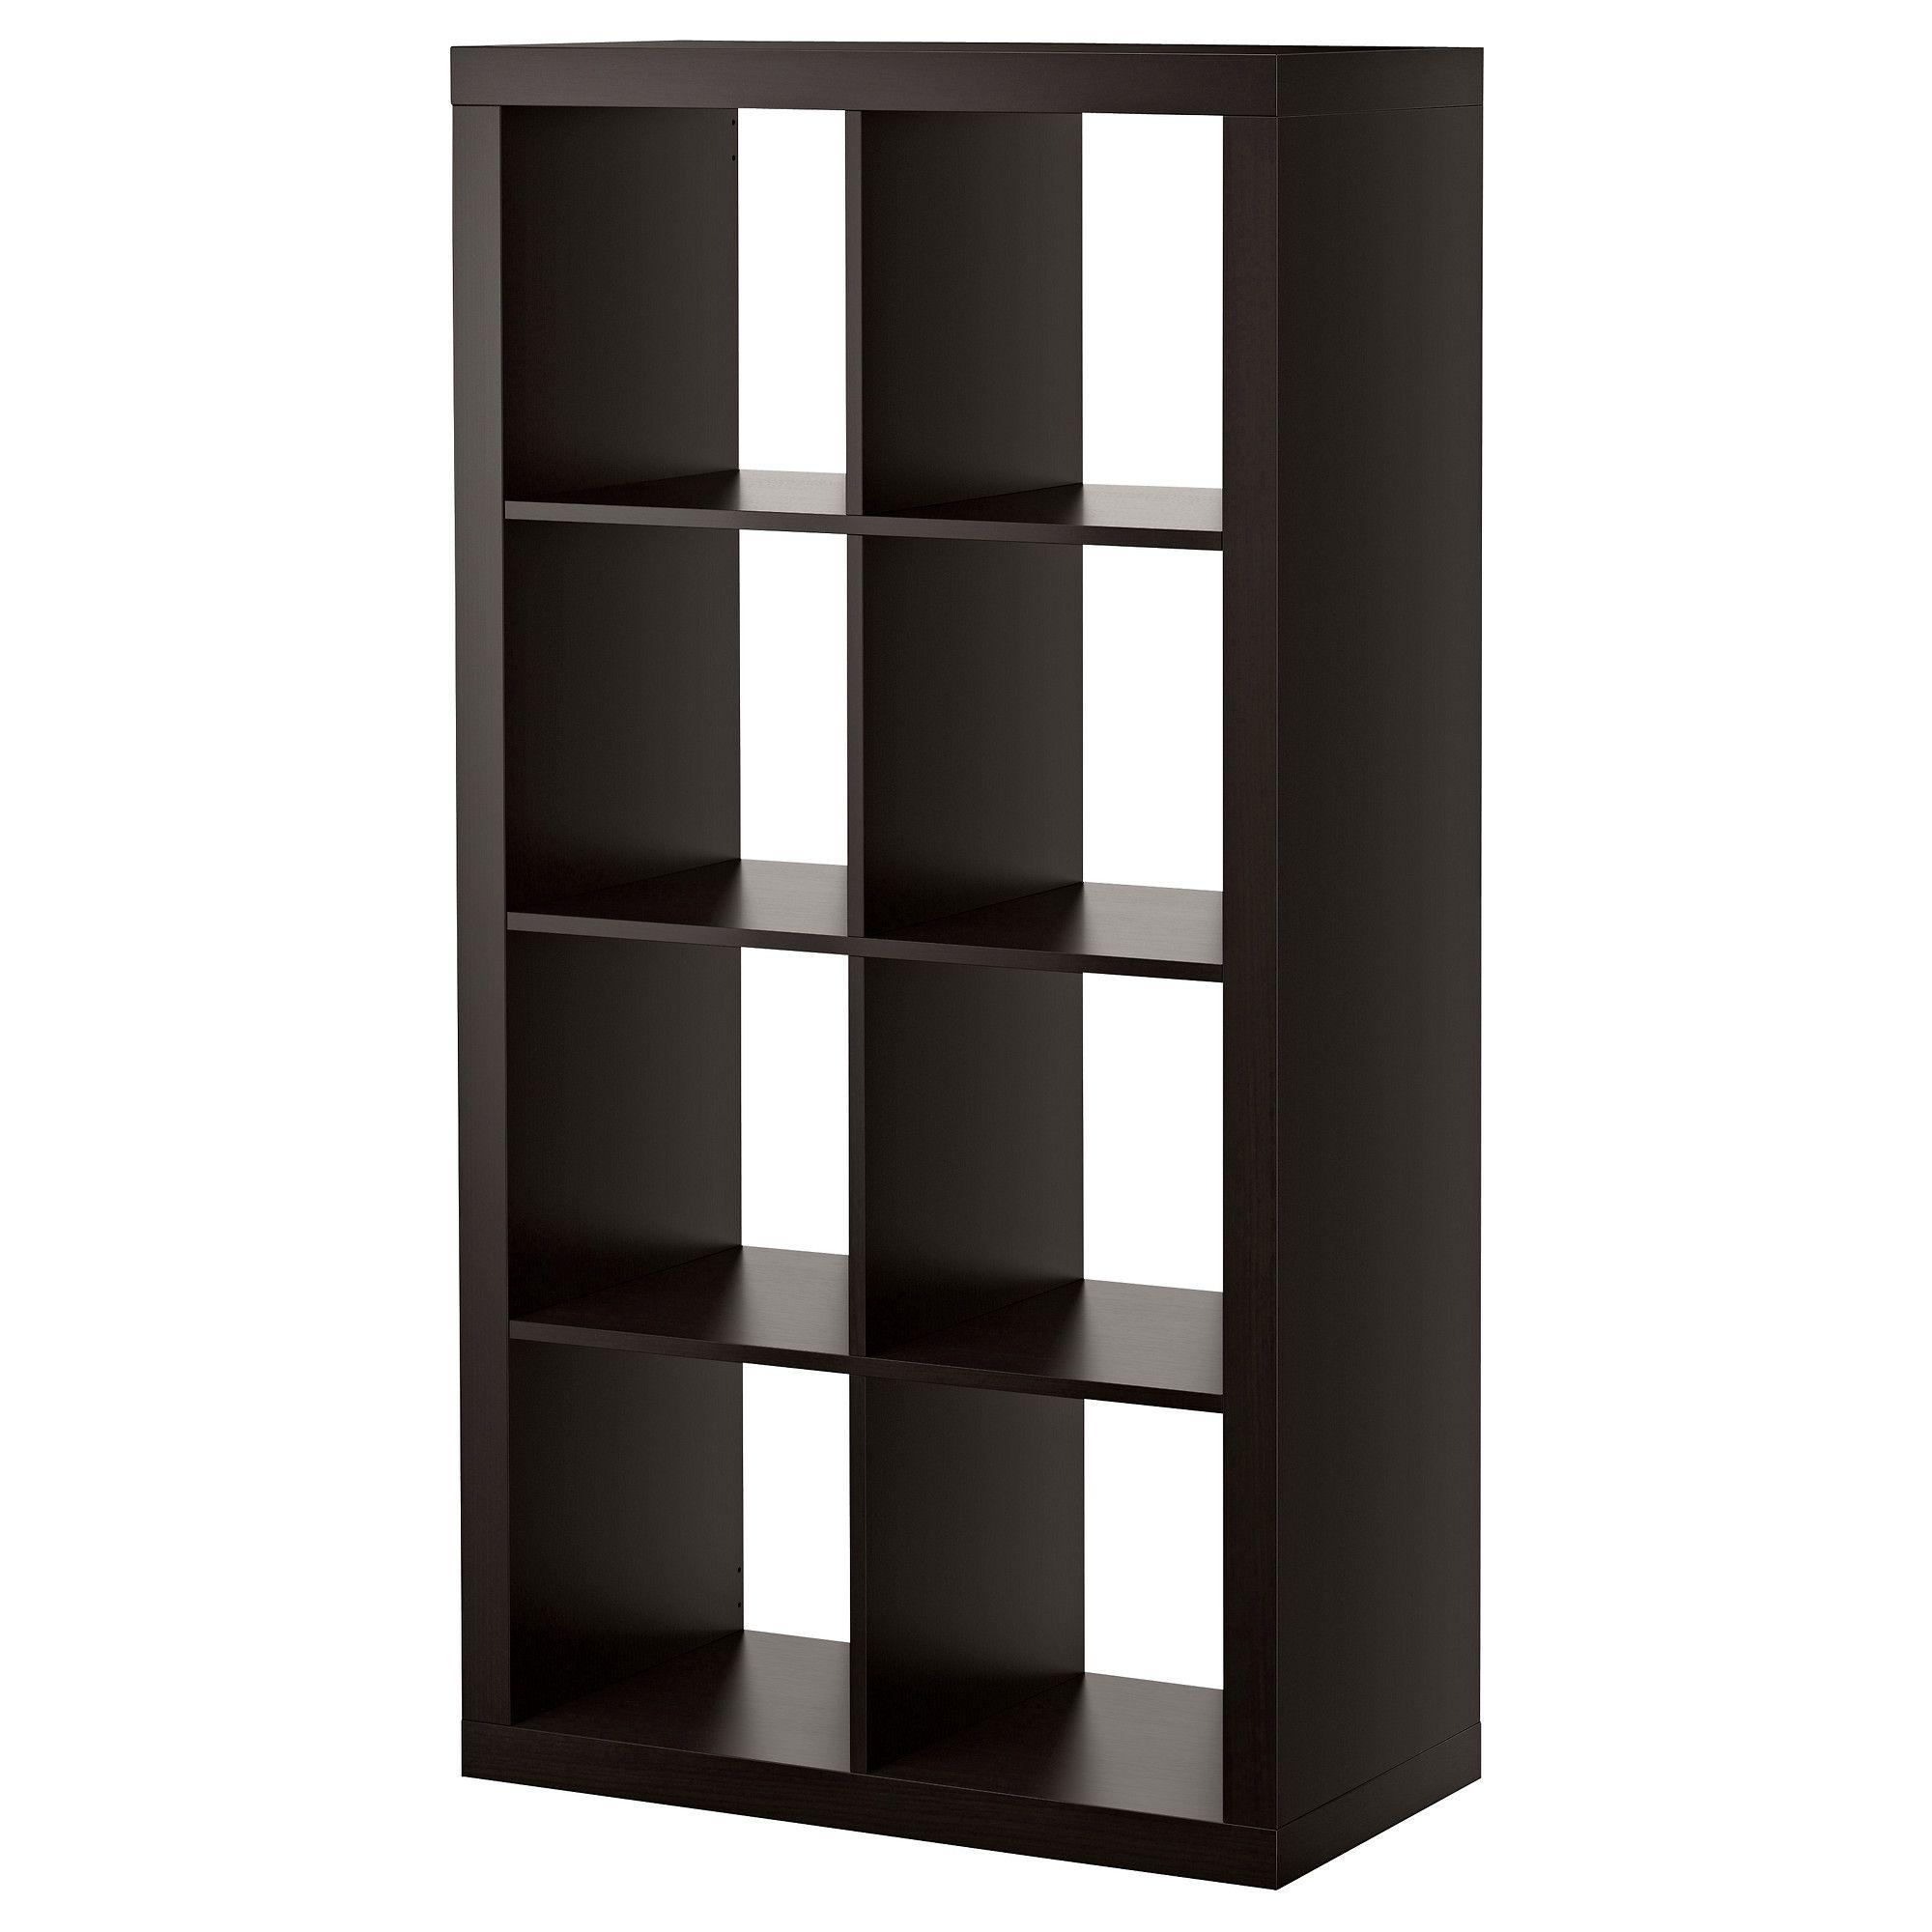 Bücherregal ikea braun  EXPEDIT Regal - schwarzbraun - IKEA 59 EUR Produktmaße Breite: 79 ...